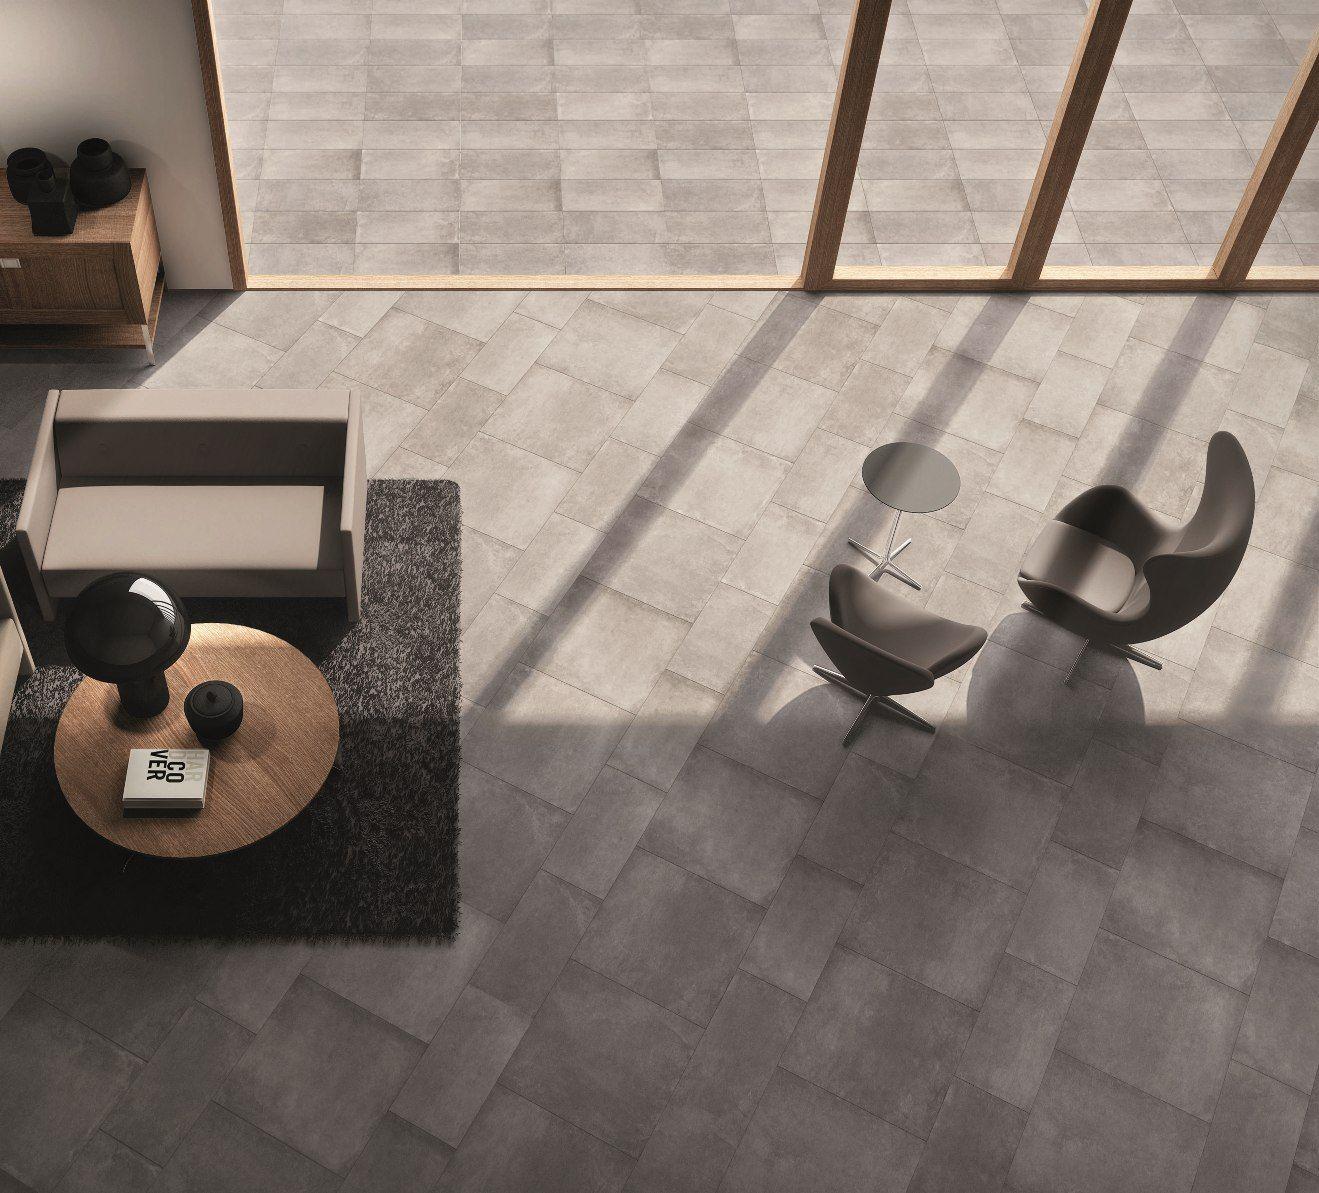 Spazio living pavimentato con docks abkemozioni colore black porcelain tiles slip rating and outdoor use dailygadgetfo Images